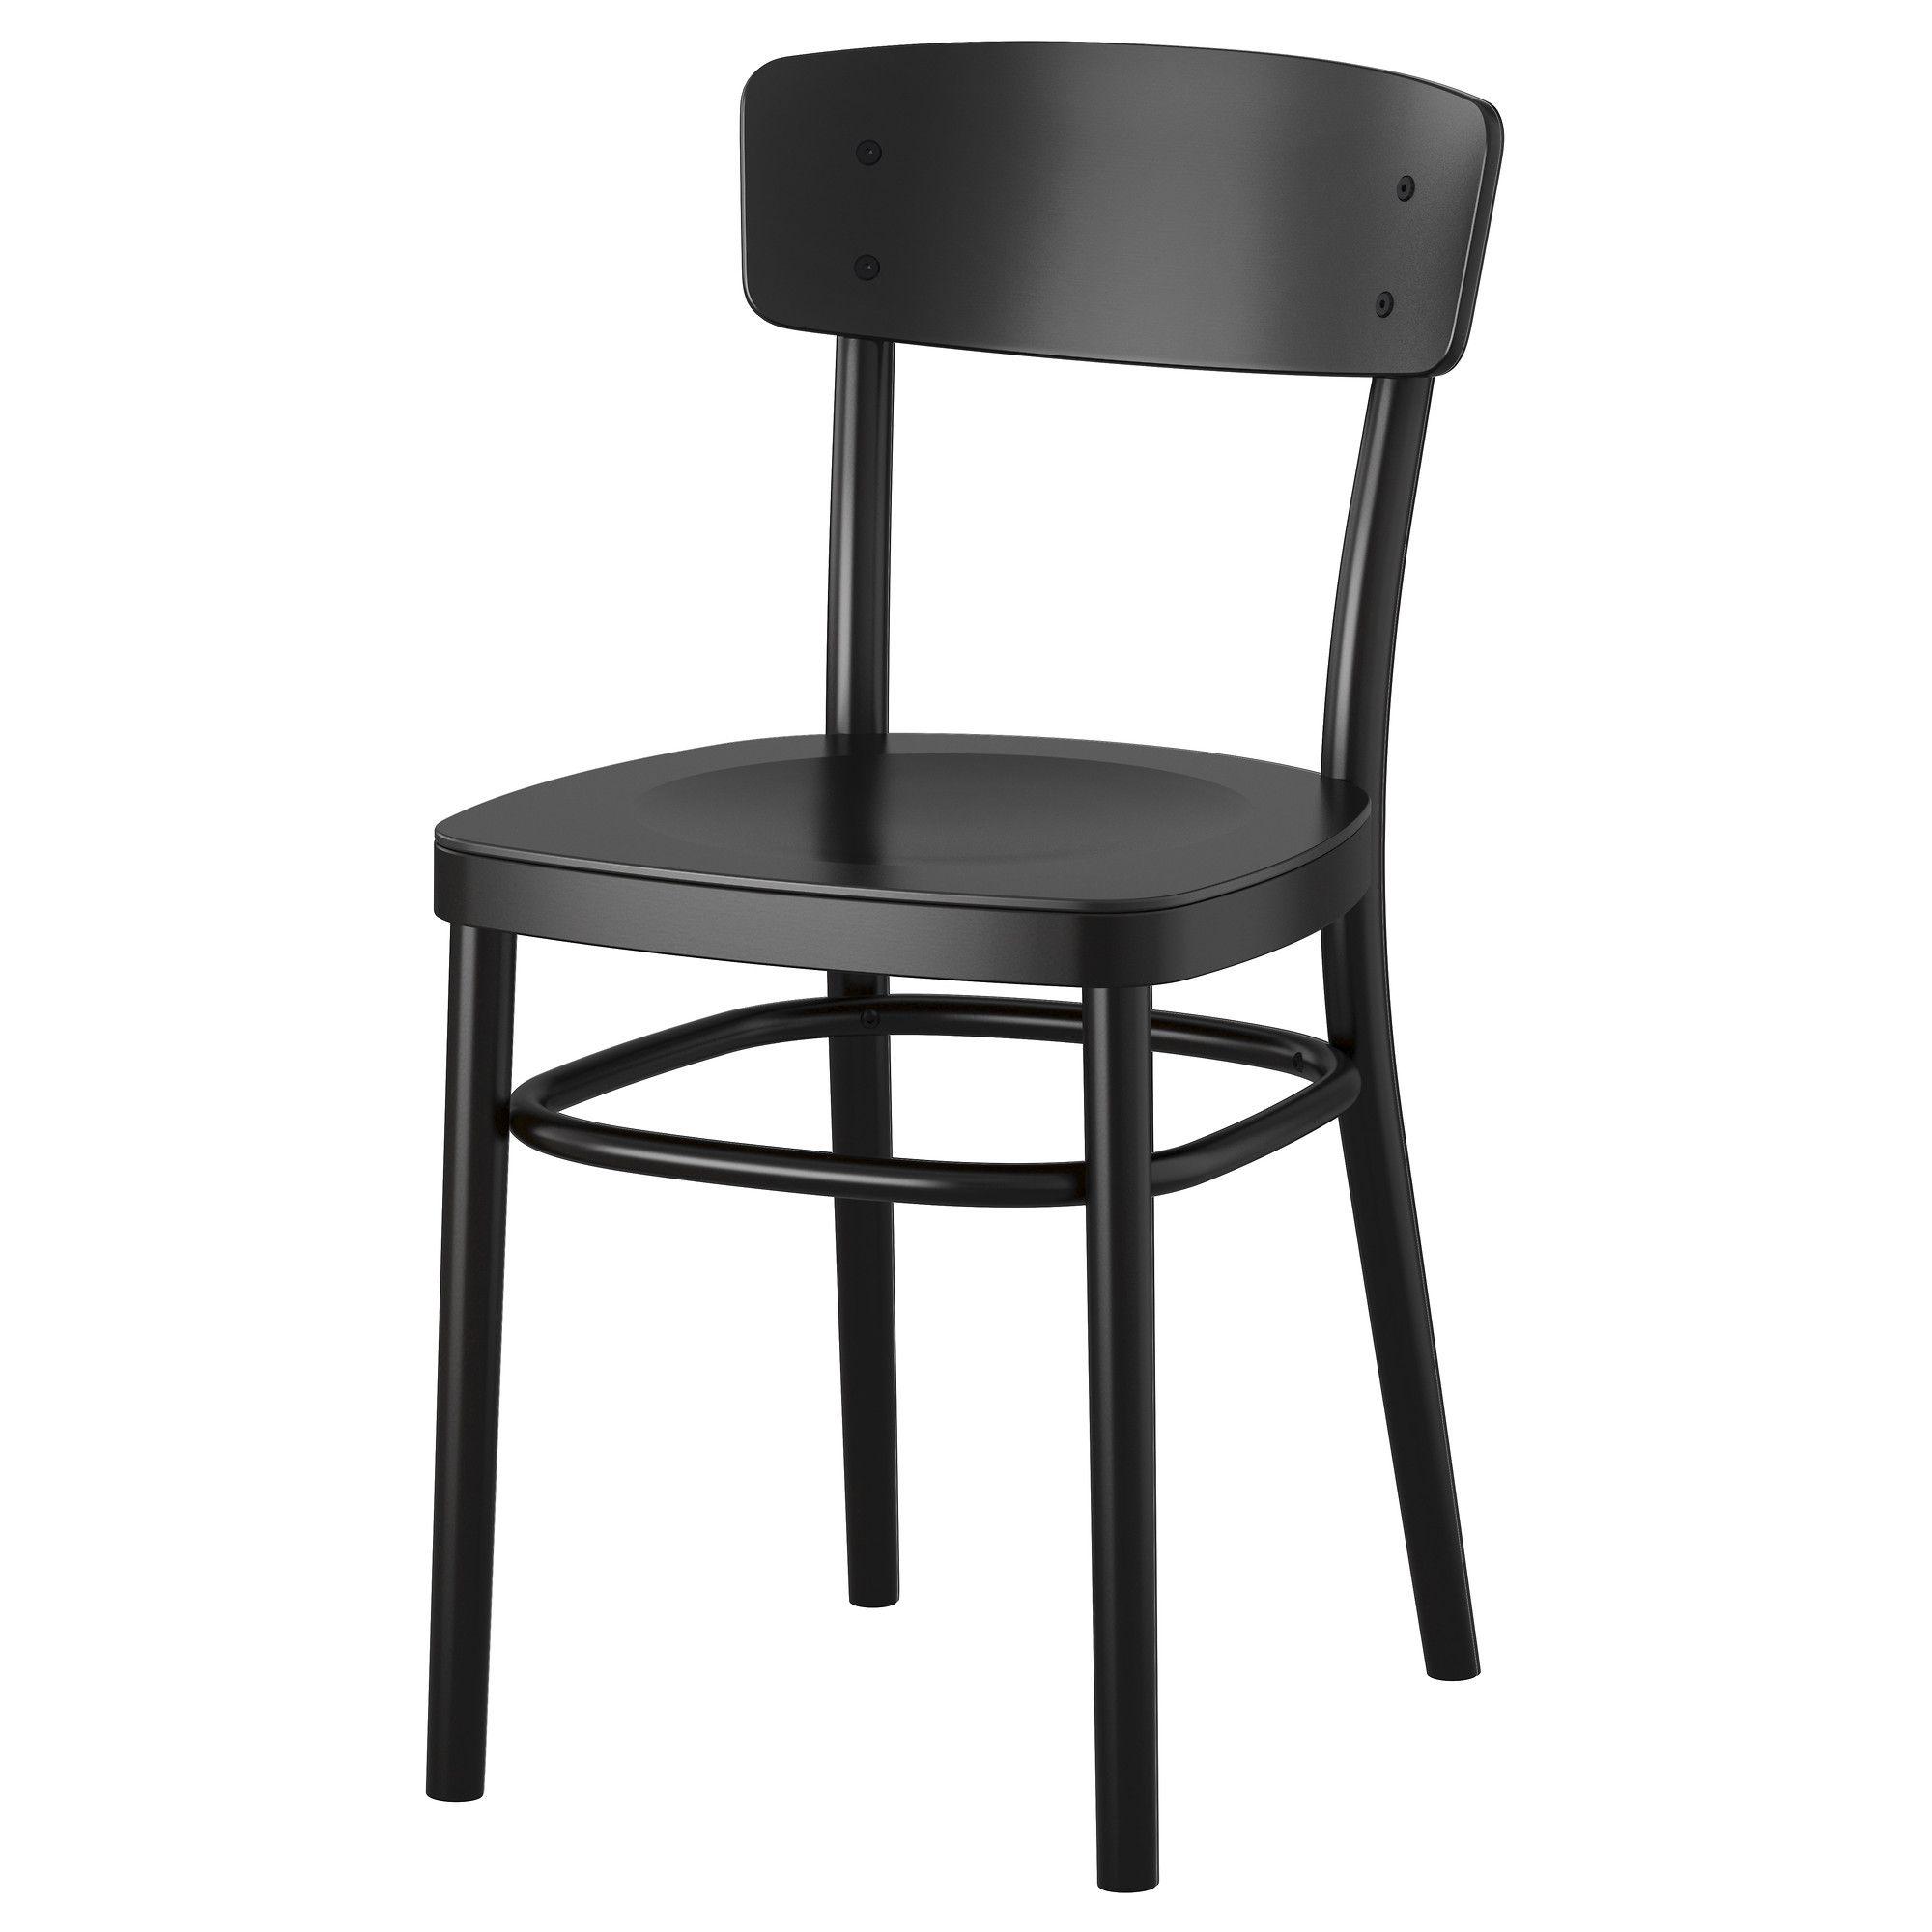 idolf chair black penthouse ikea stuhl. Black Bedroom Furniture Sets. Home Design Ideas